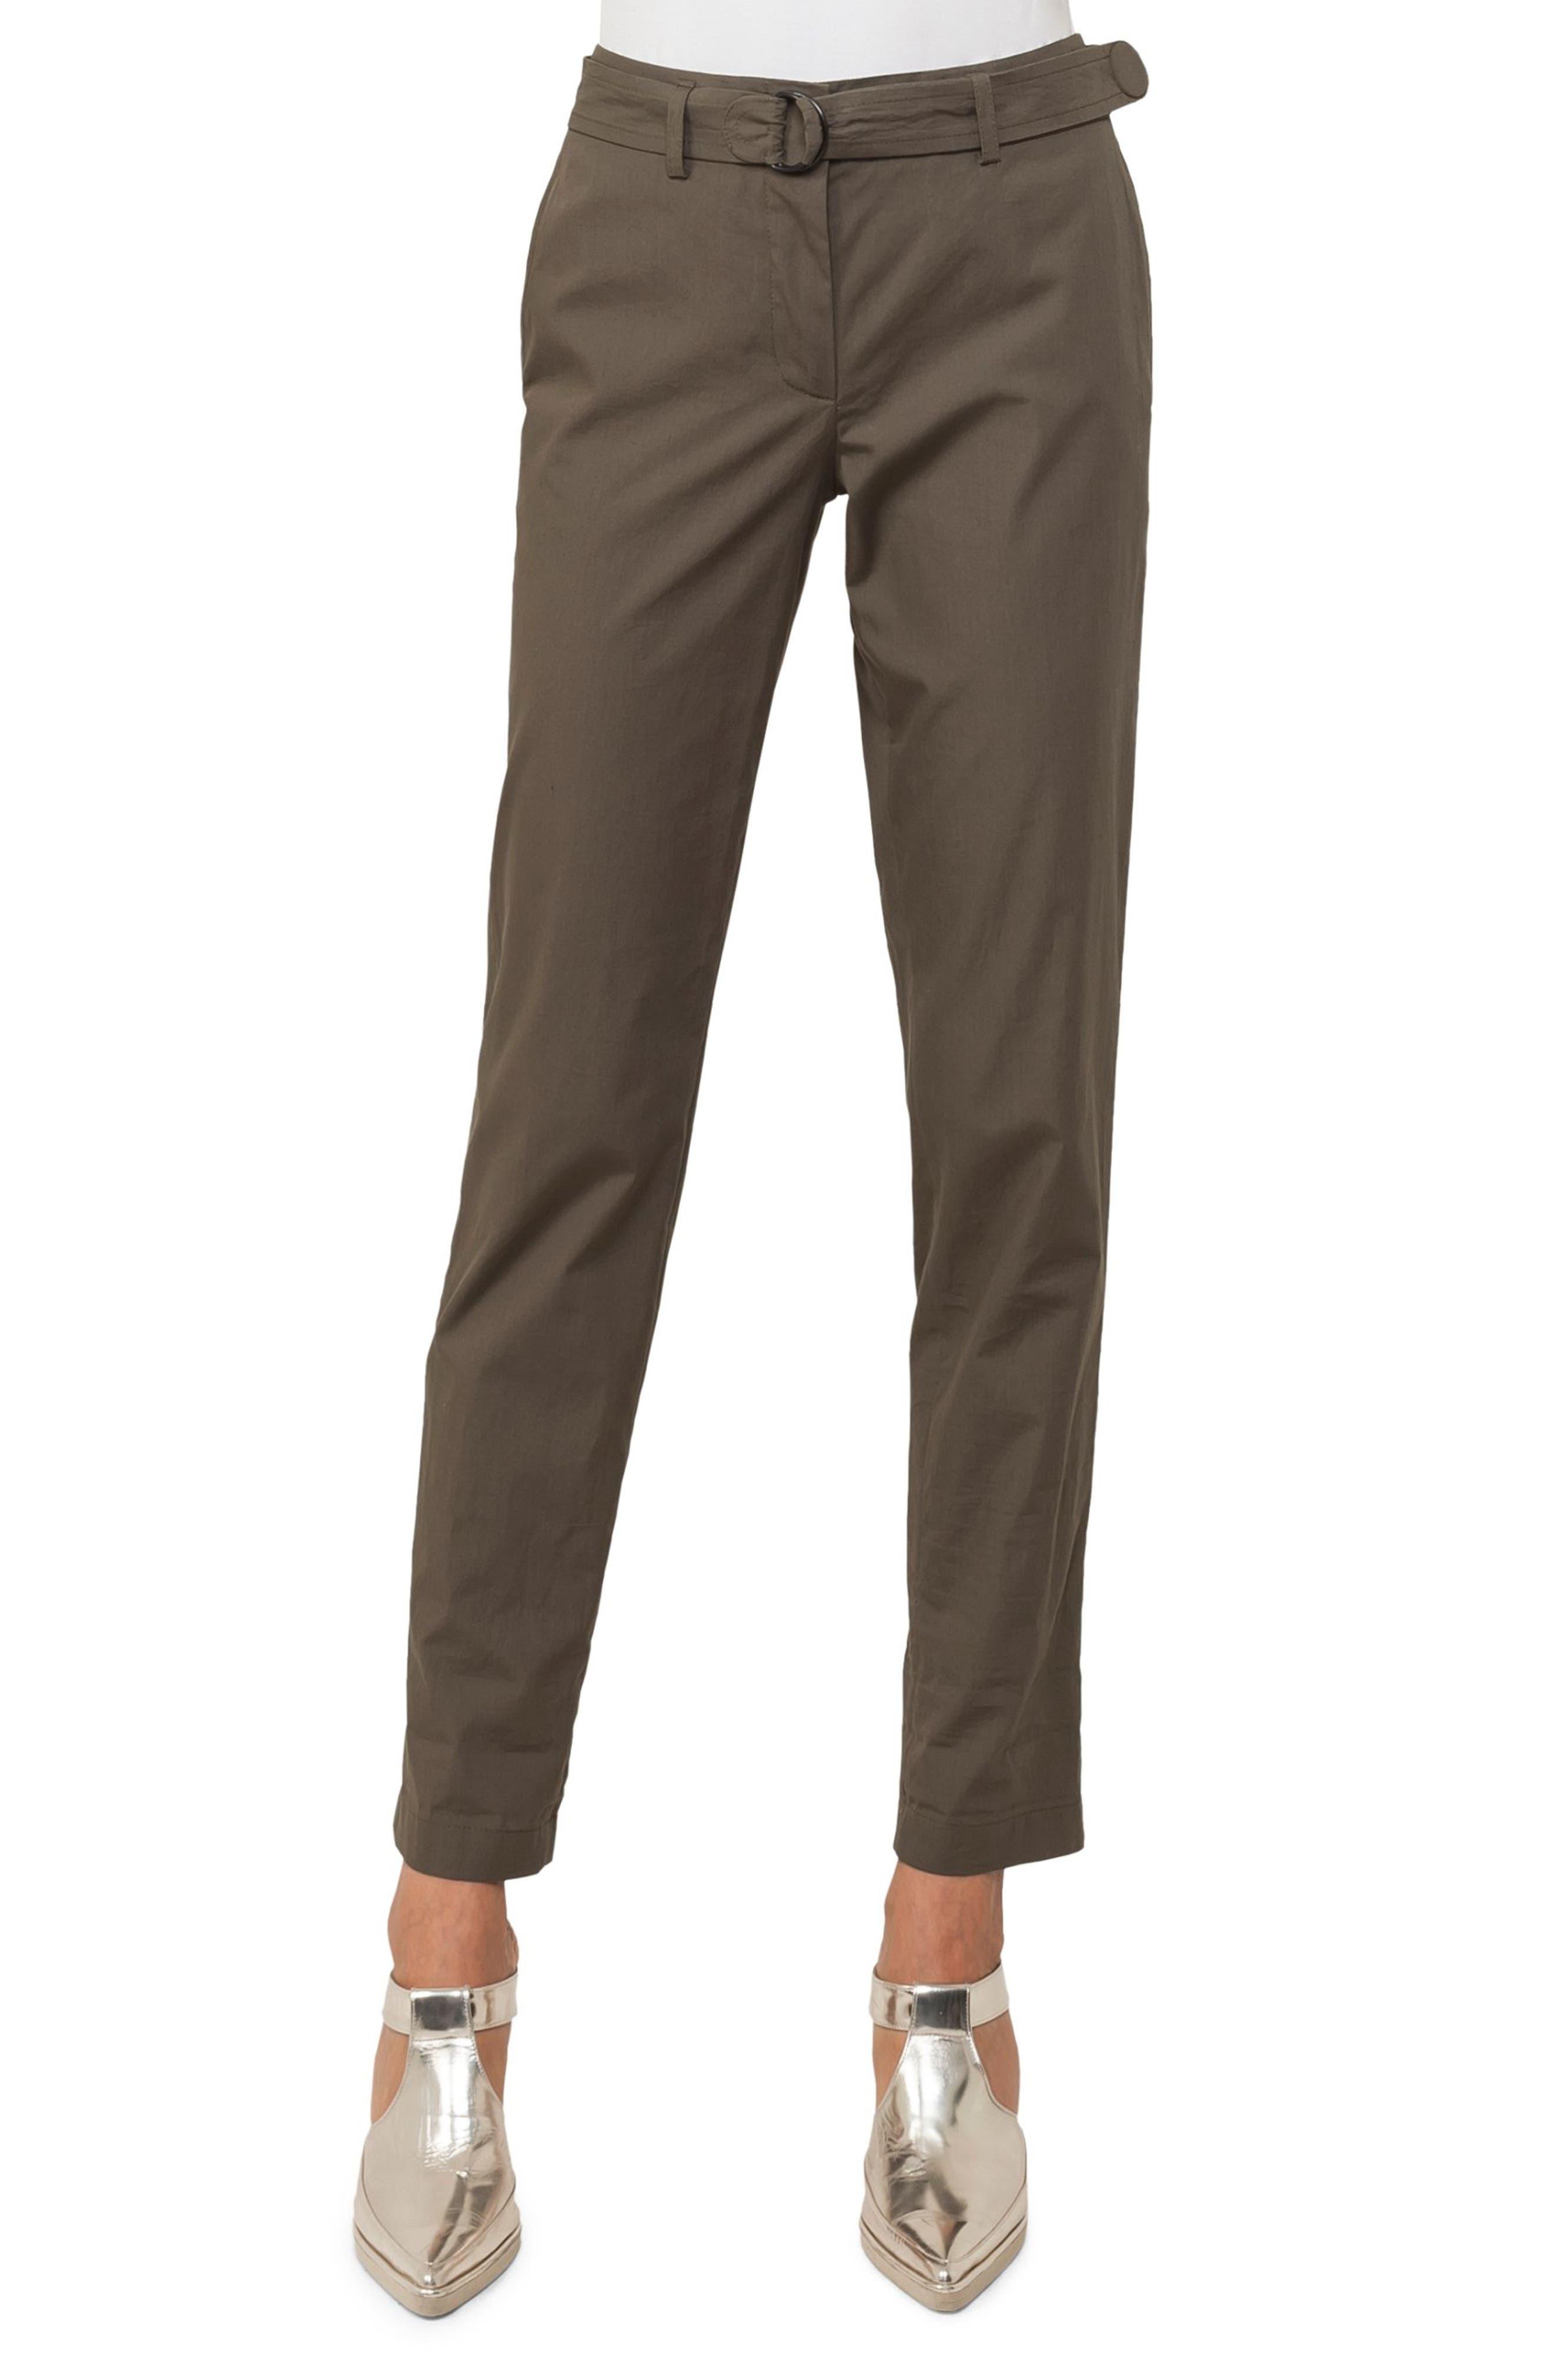 Fallon Chino Pants,                         Main,                         color, Avocado